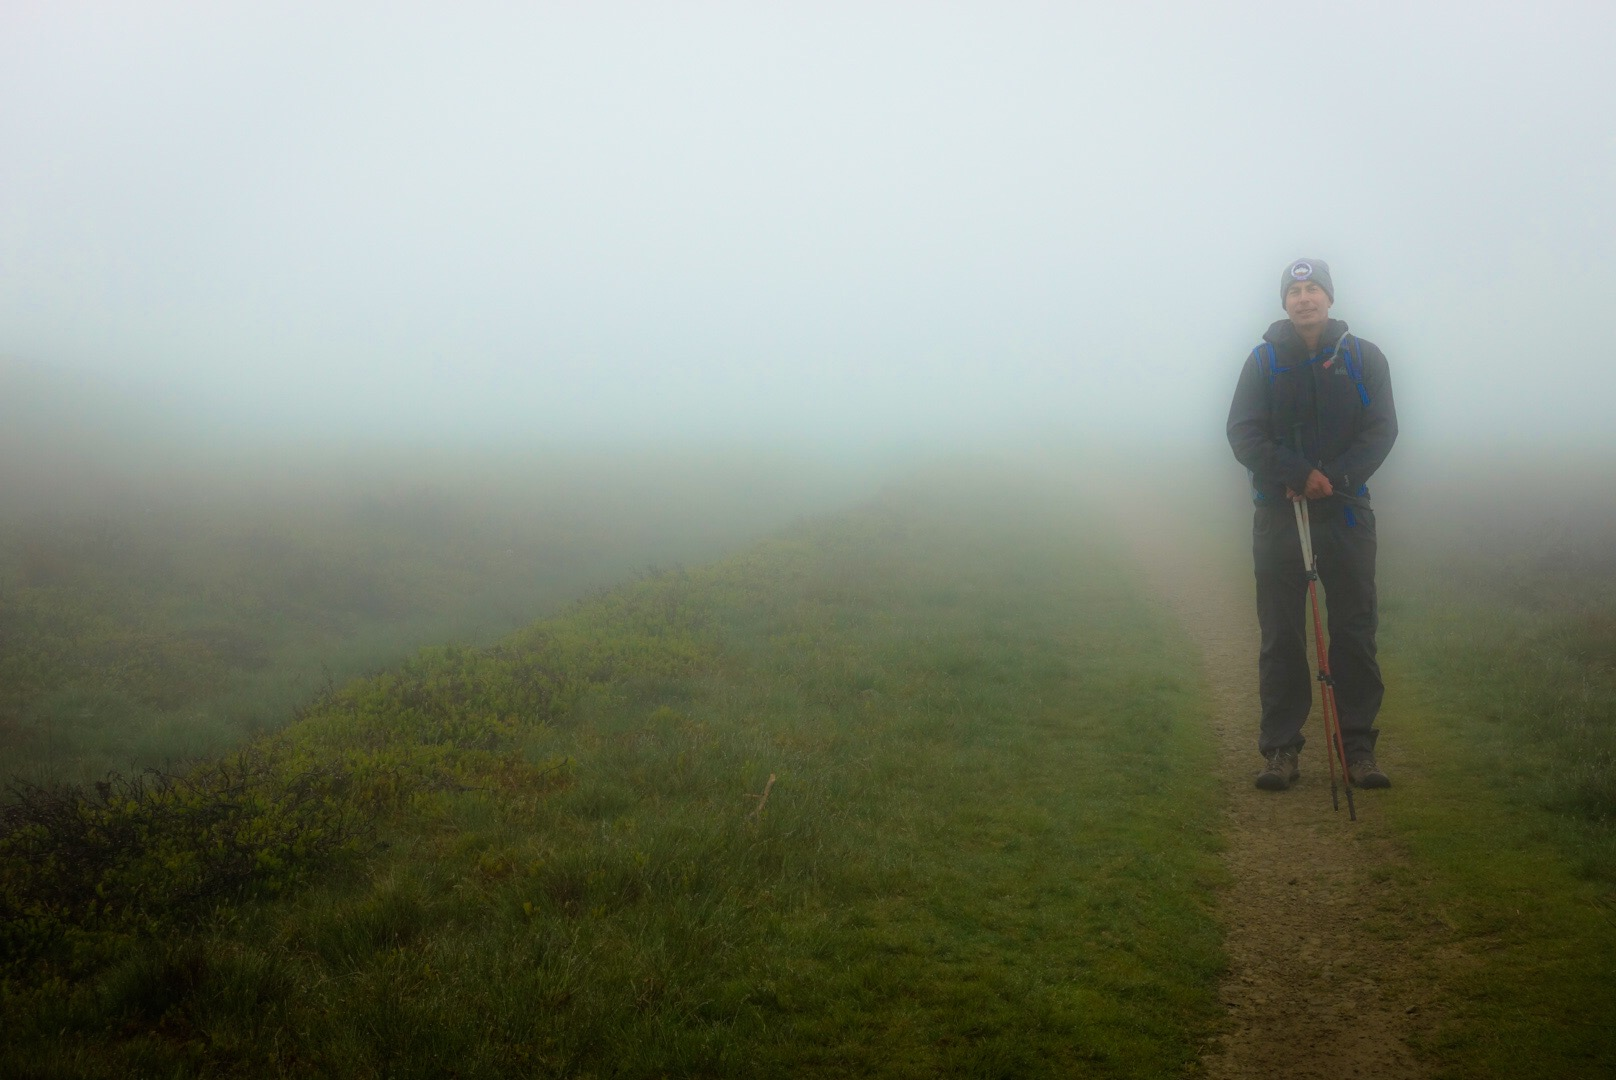 Joel in Fog